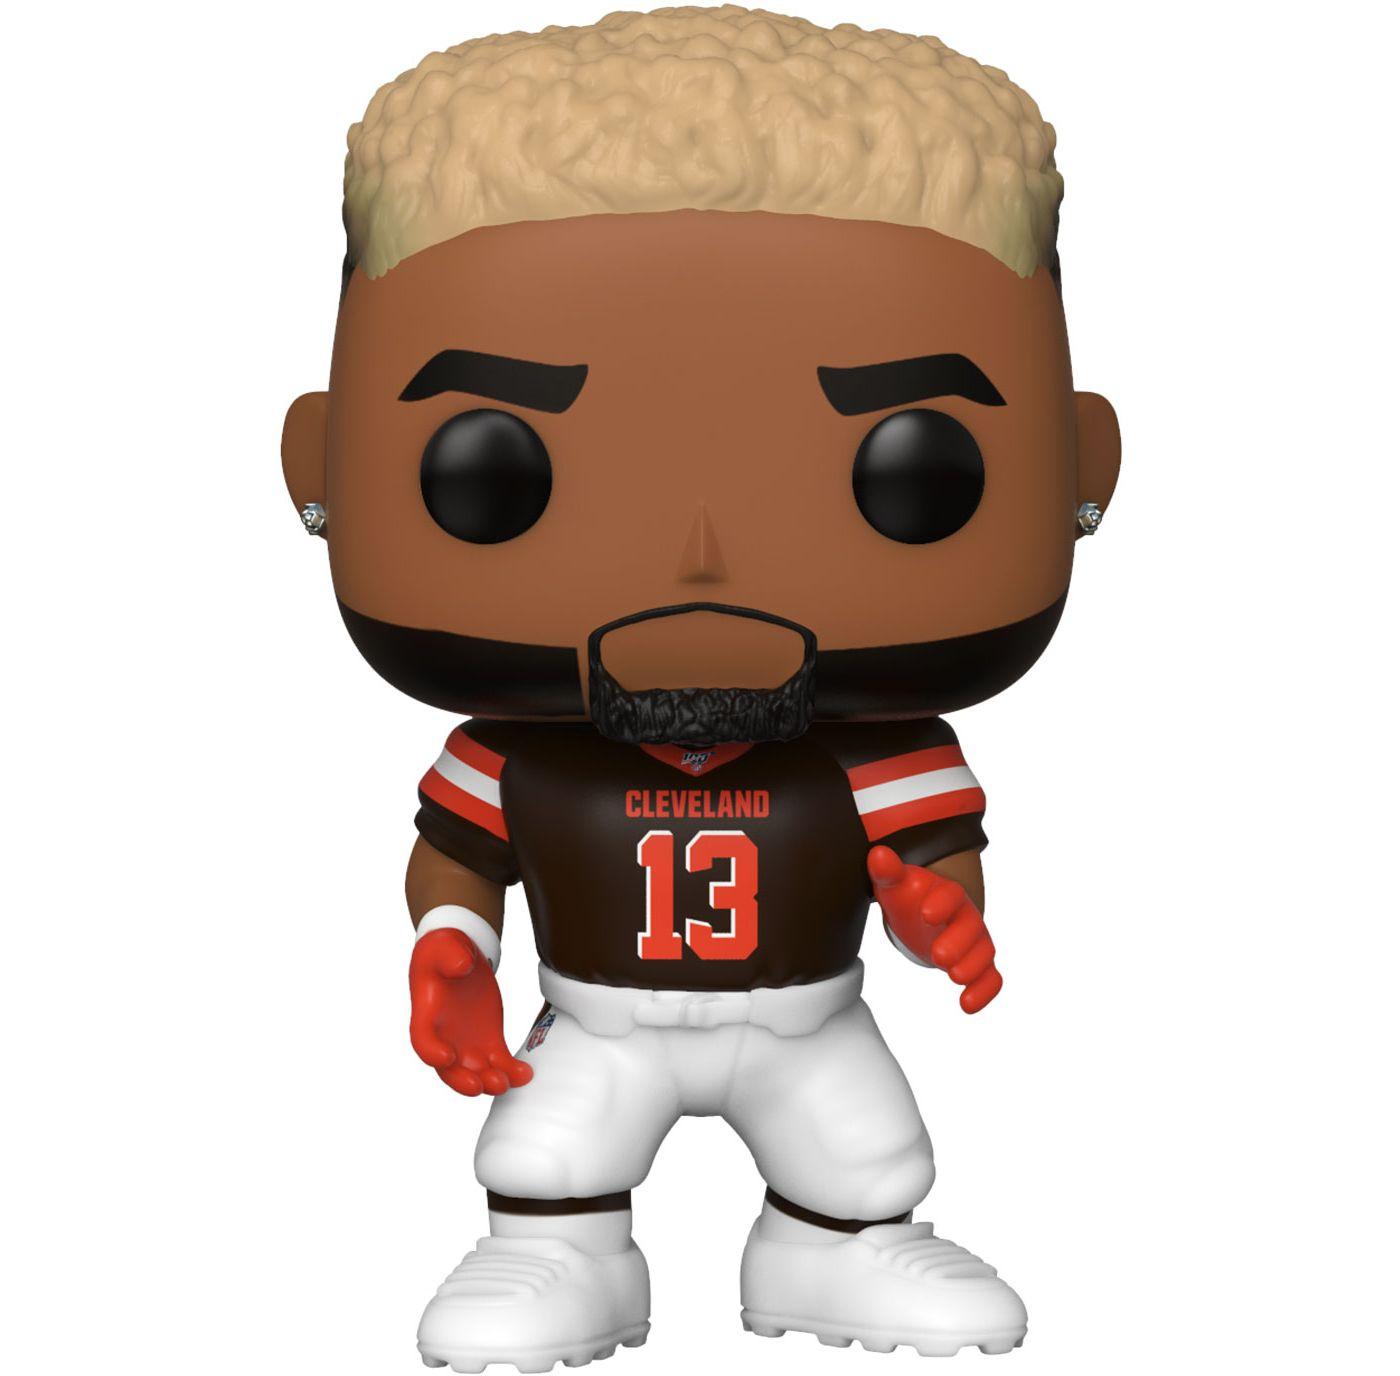 Funko POP! Cleveland Browns Odell Beckham Jr. Figure